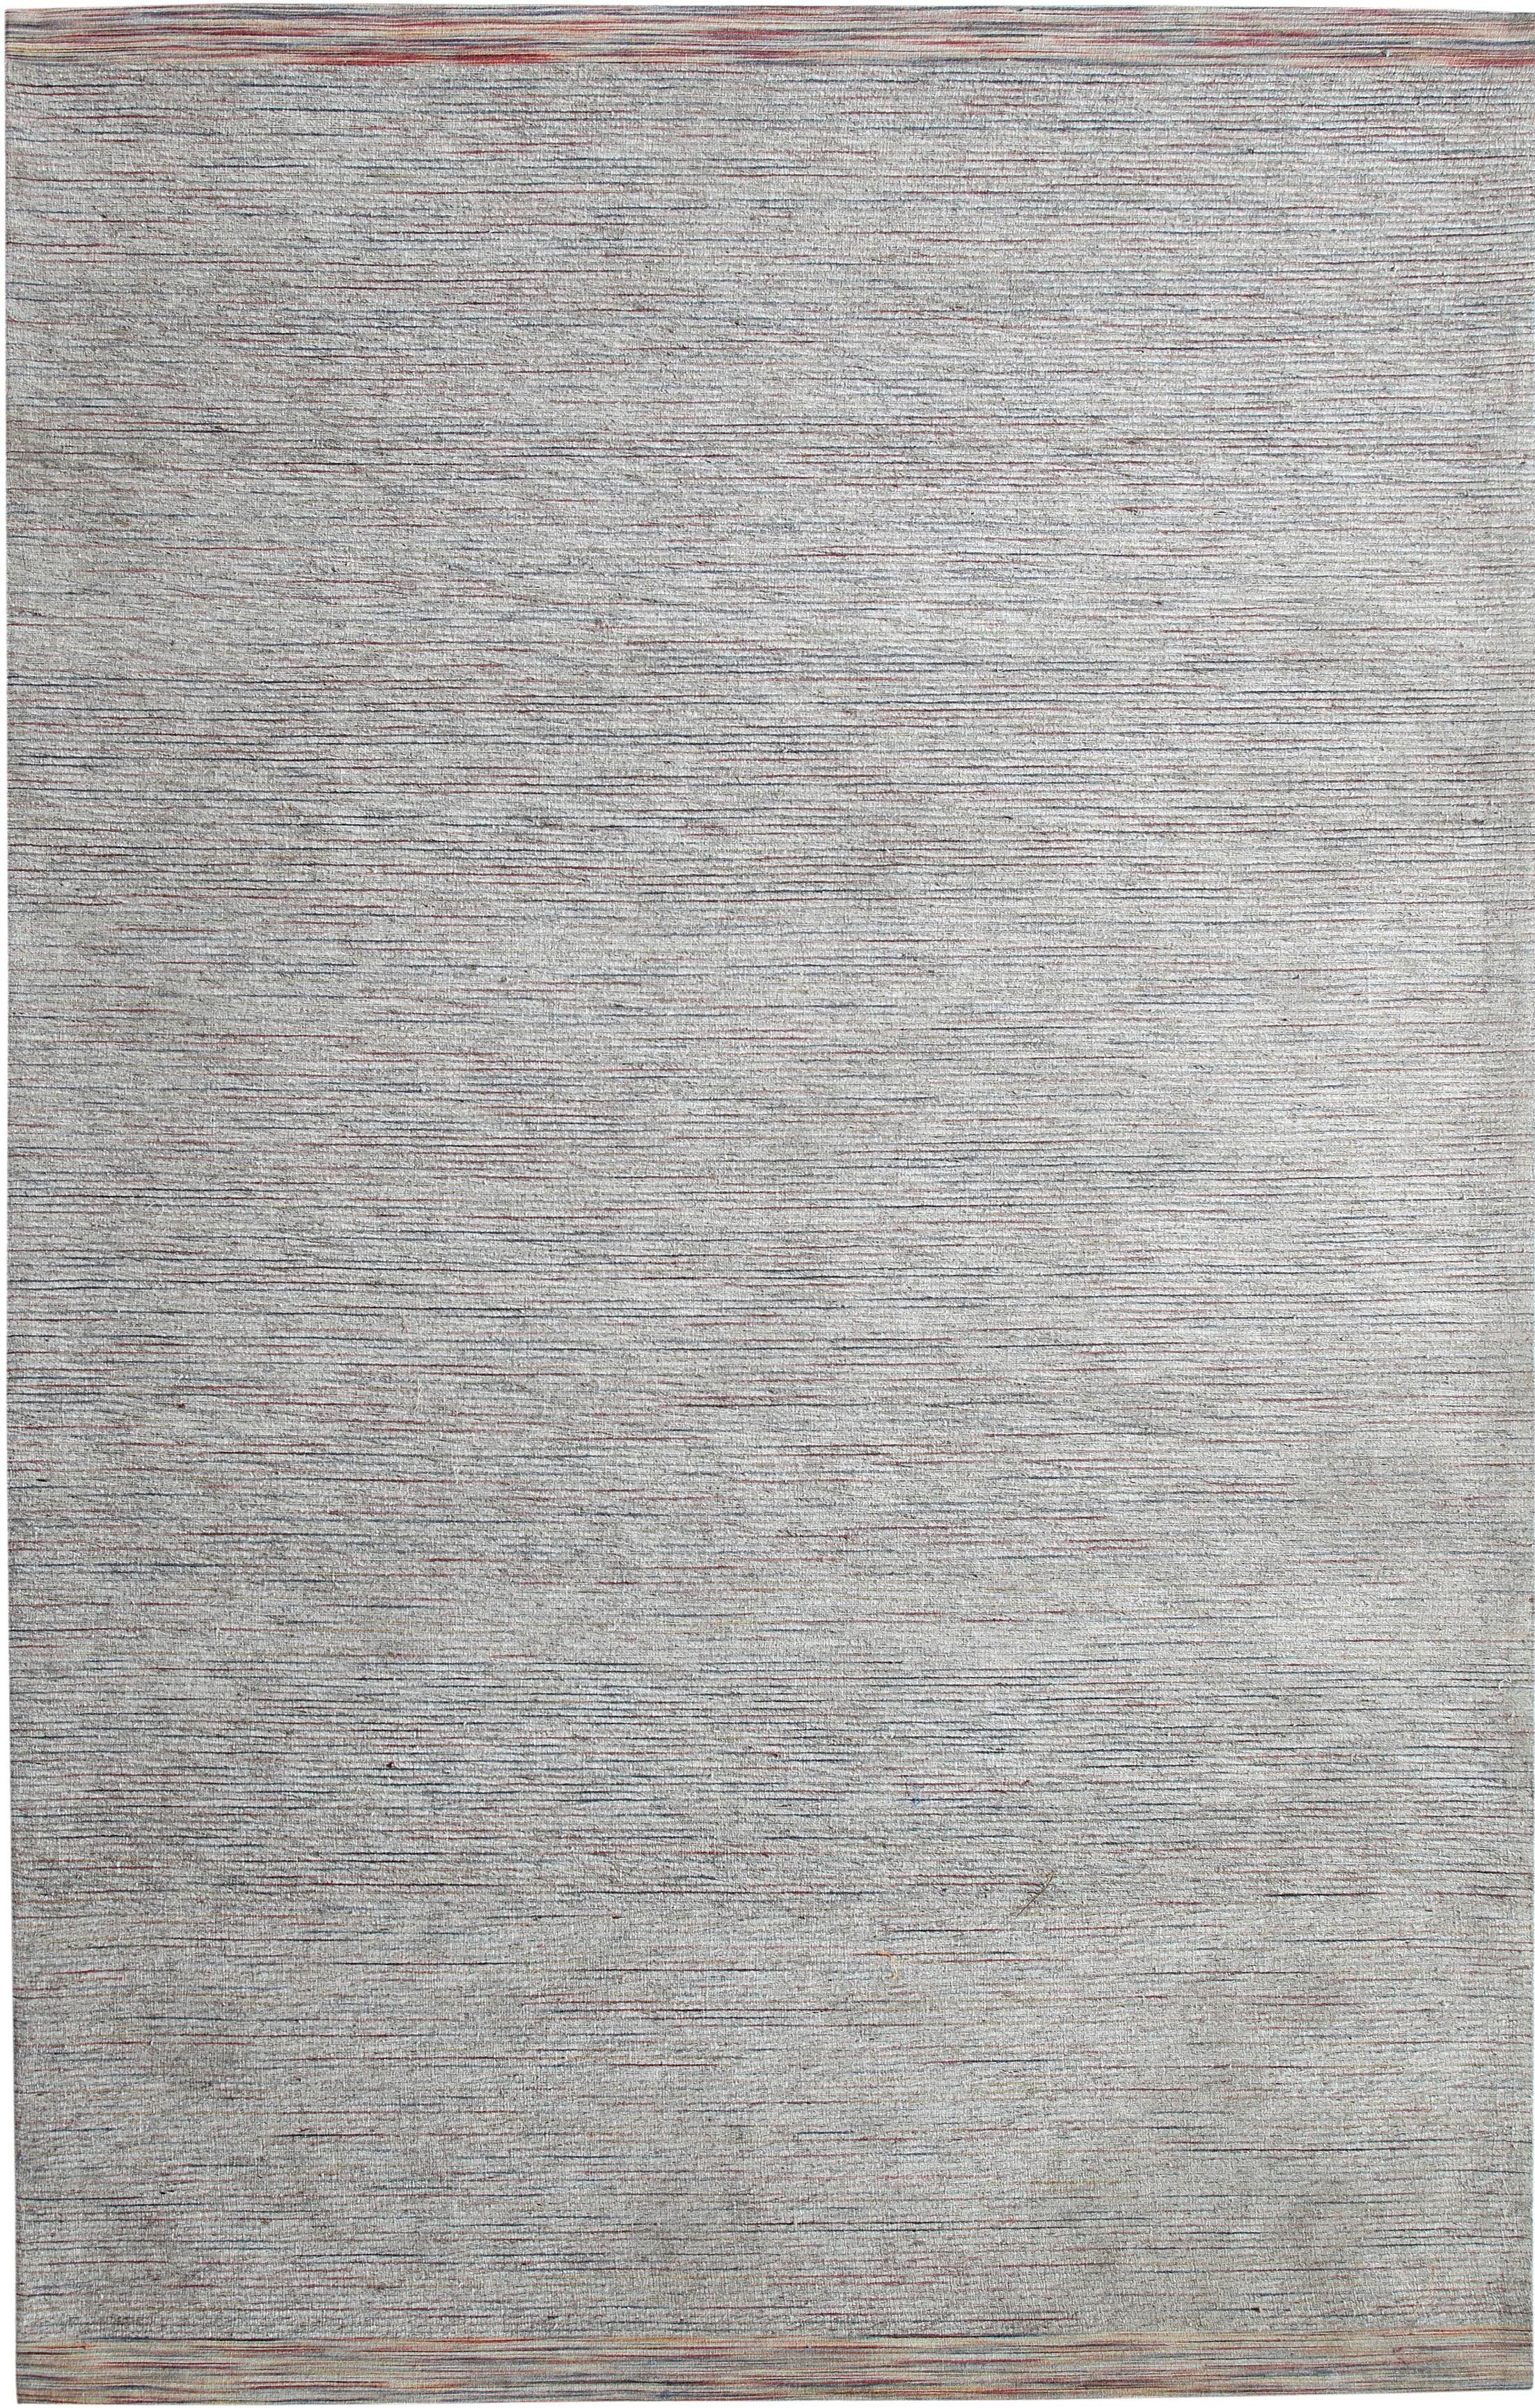 Hawtree Hand-Woven Grey Area Rug Rug Size: Rectangle 4' x 6'